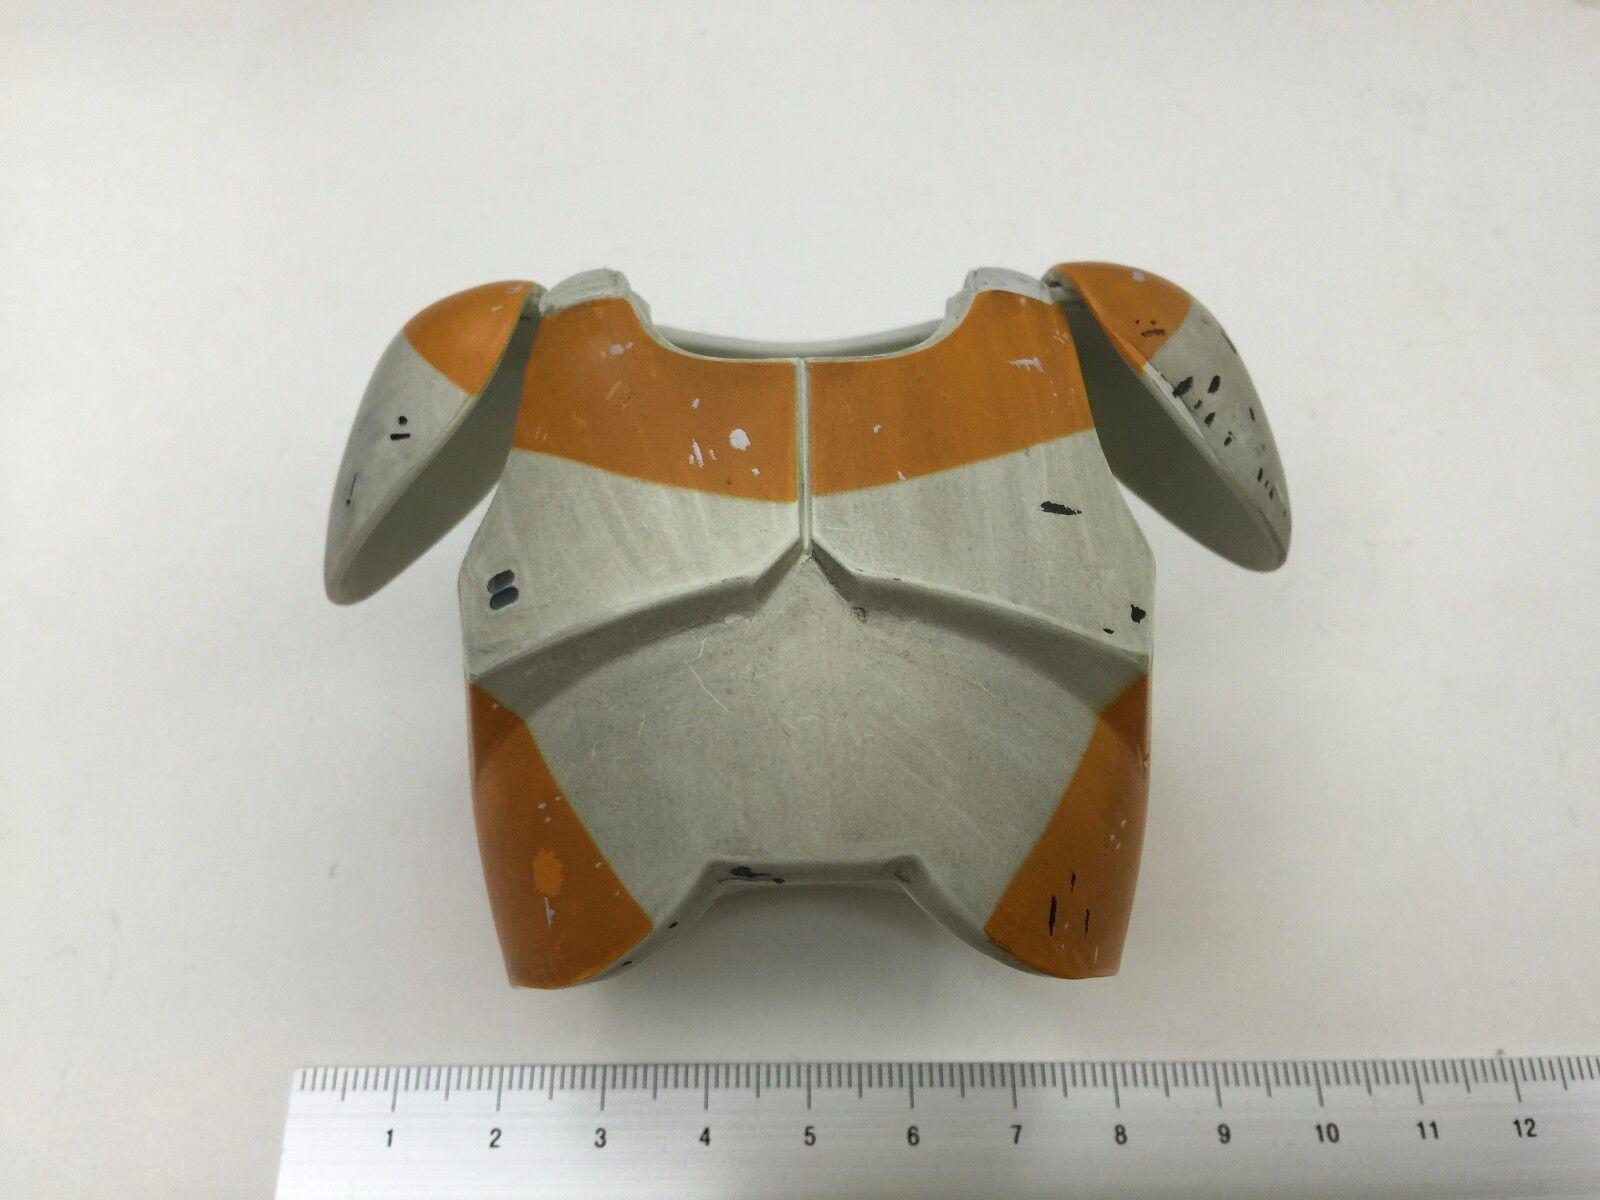 ... 1   6 - skala star - wars - klon soldat 212 und perfekte brust...